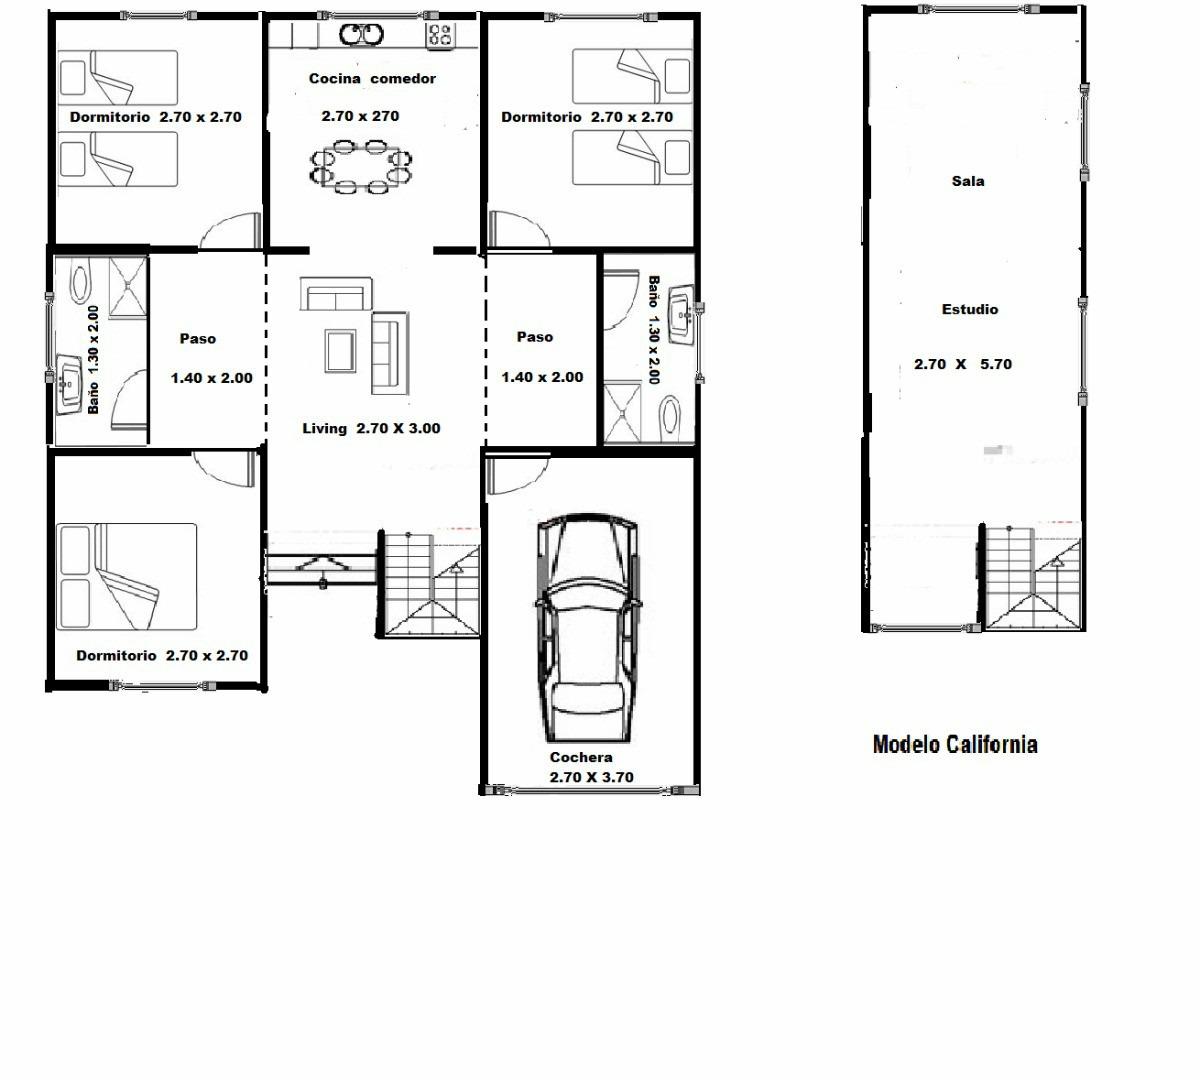 Viviendas roca tipo americano planos de casas for Programa para planos de viviendas